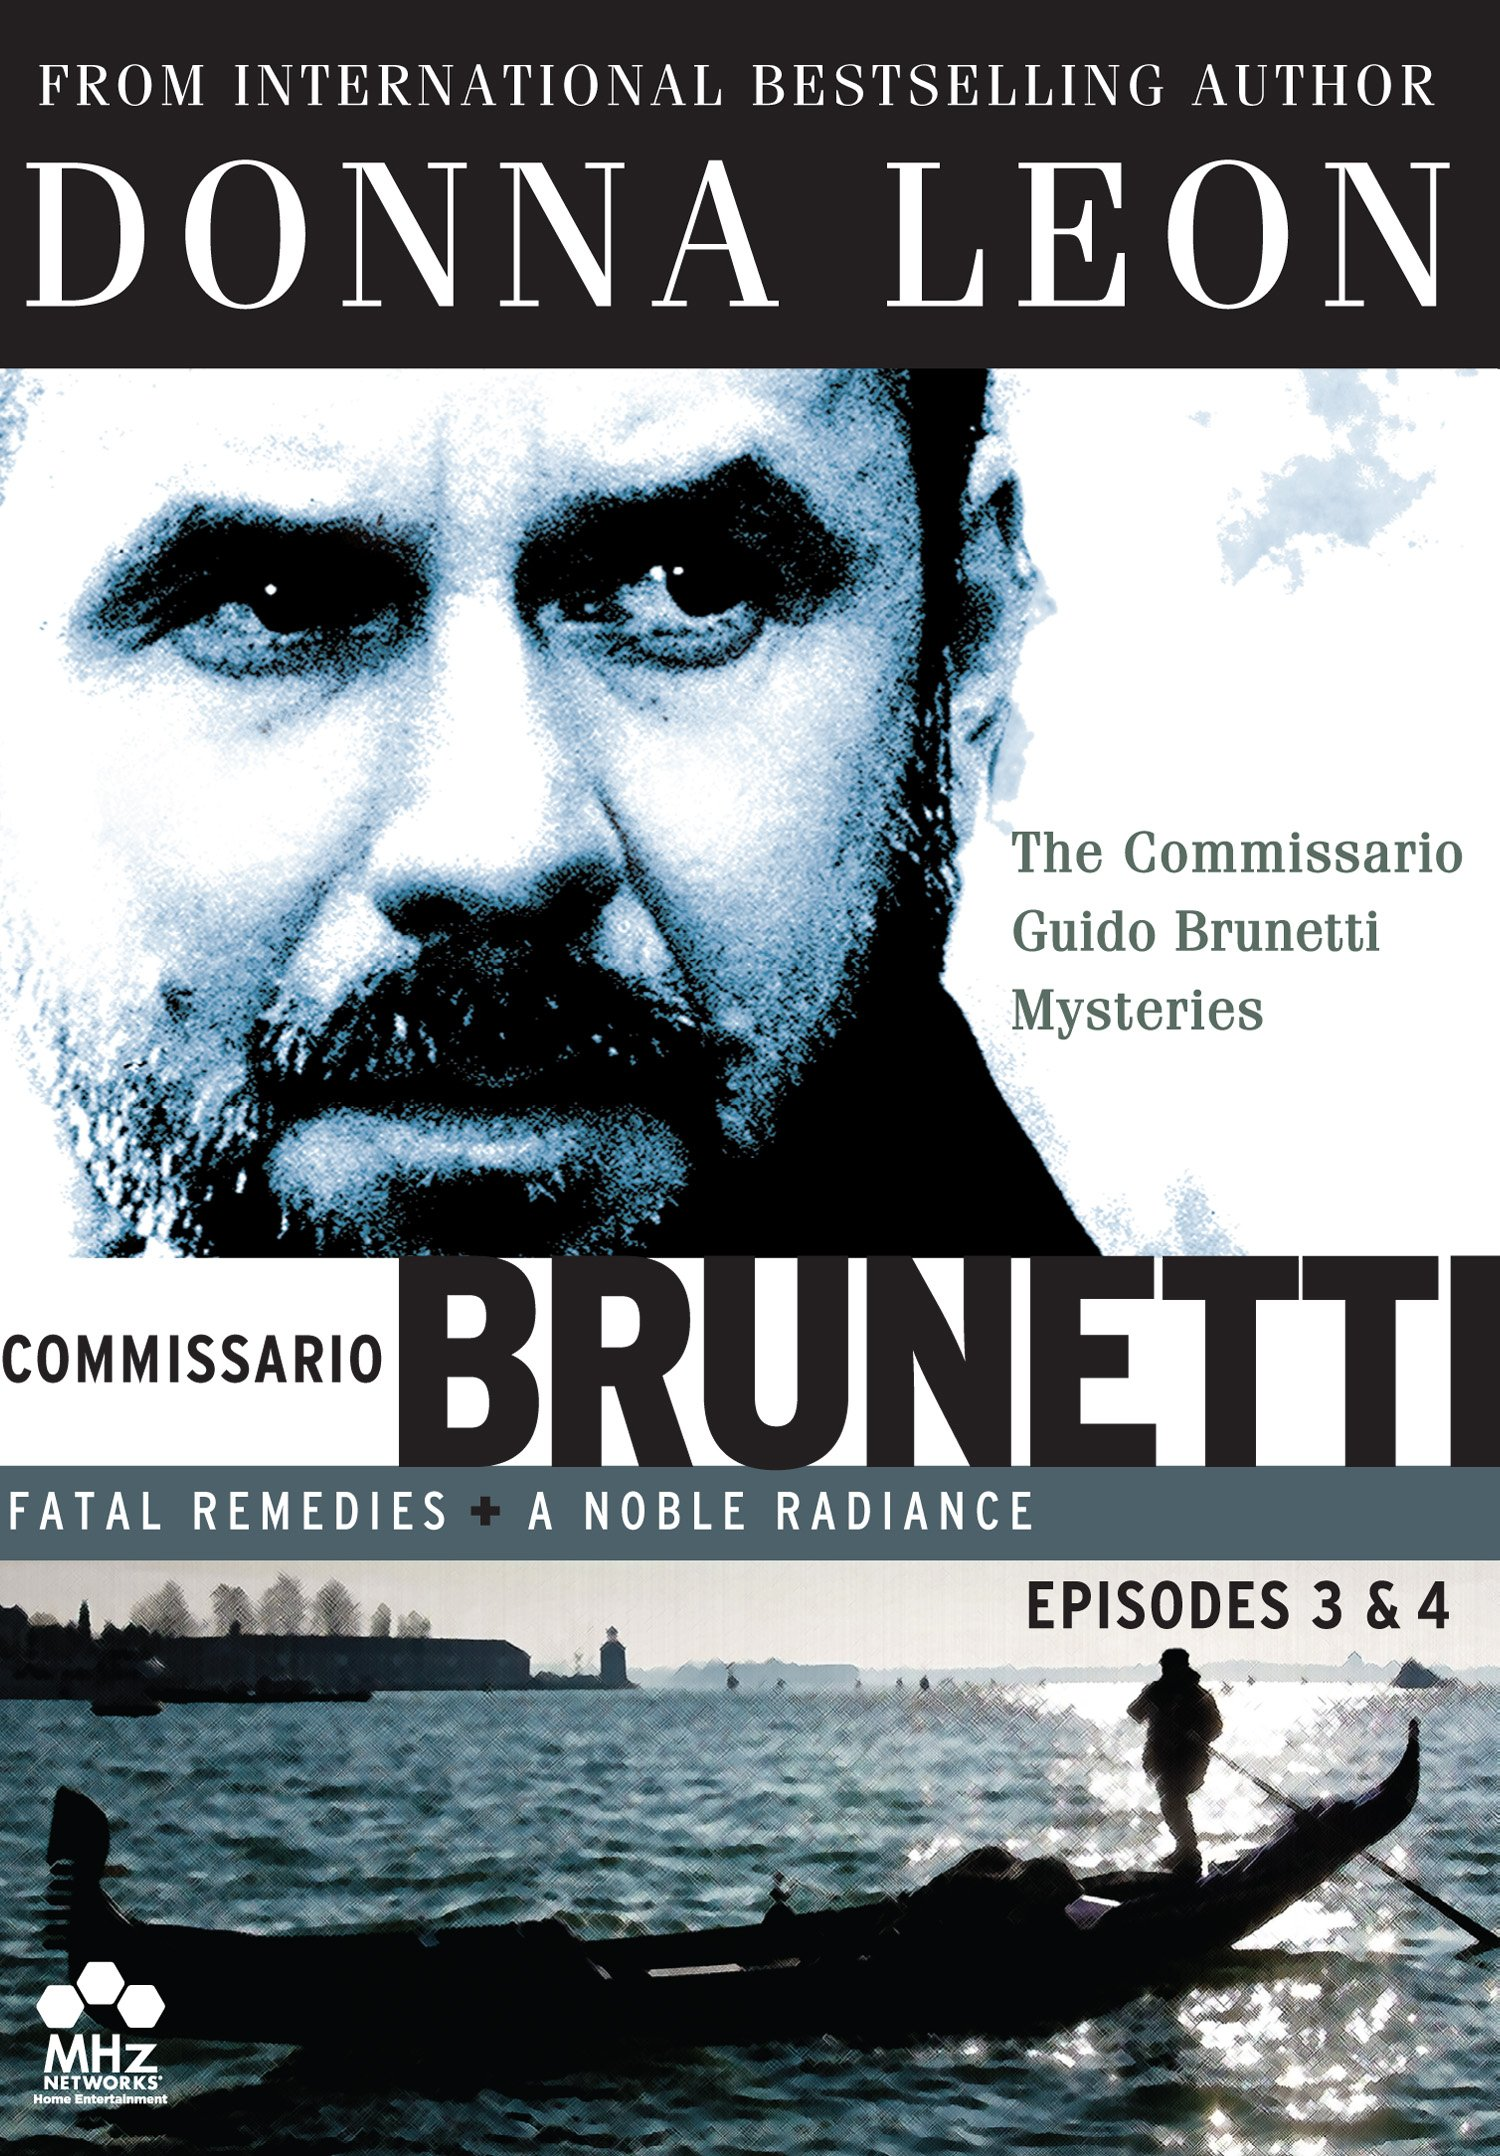 Donna Leon's Commissario Brunetti Mysteries, Episodes 3 & 4